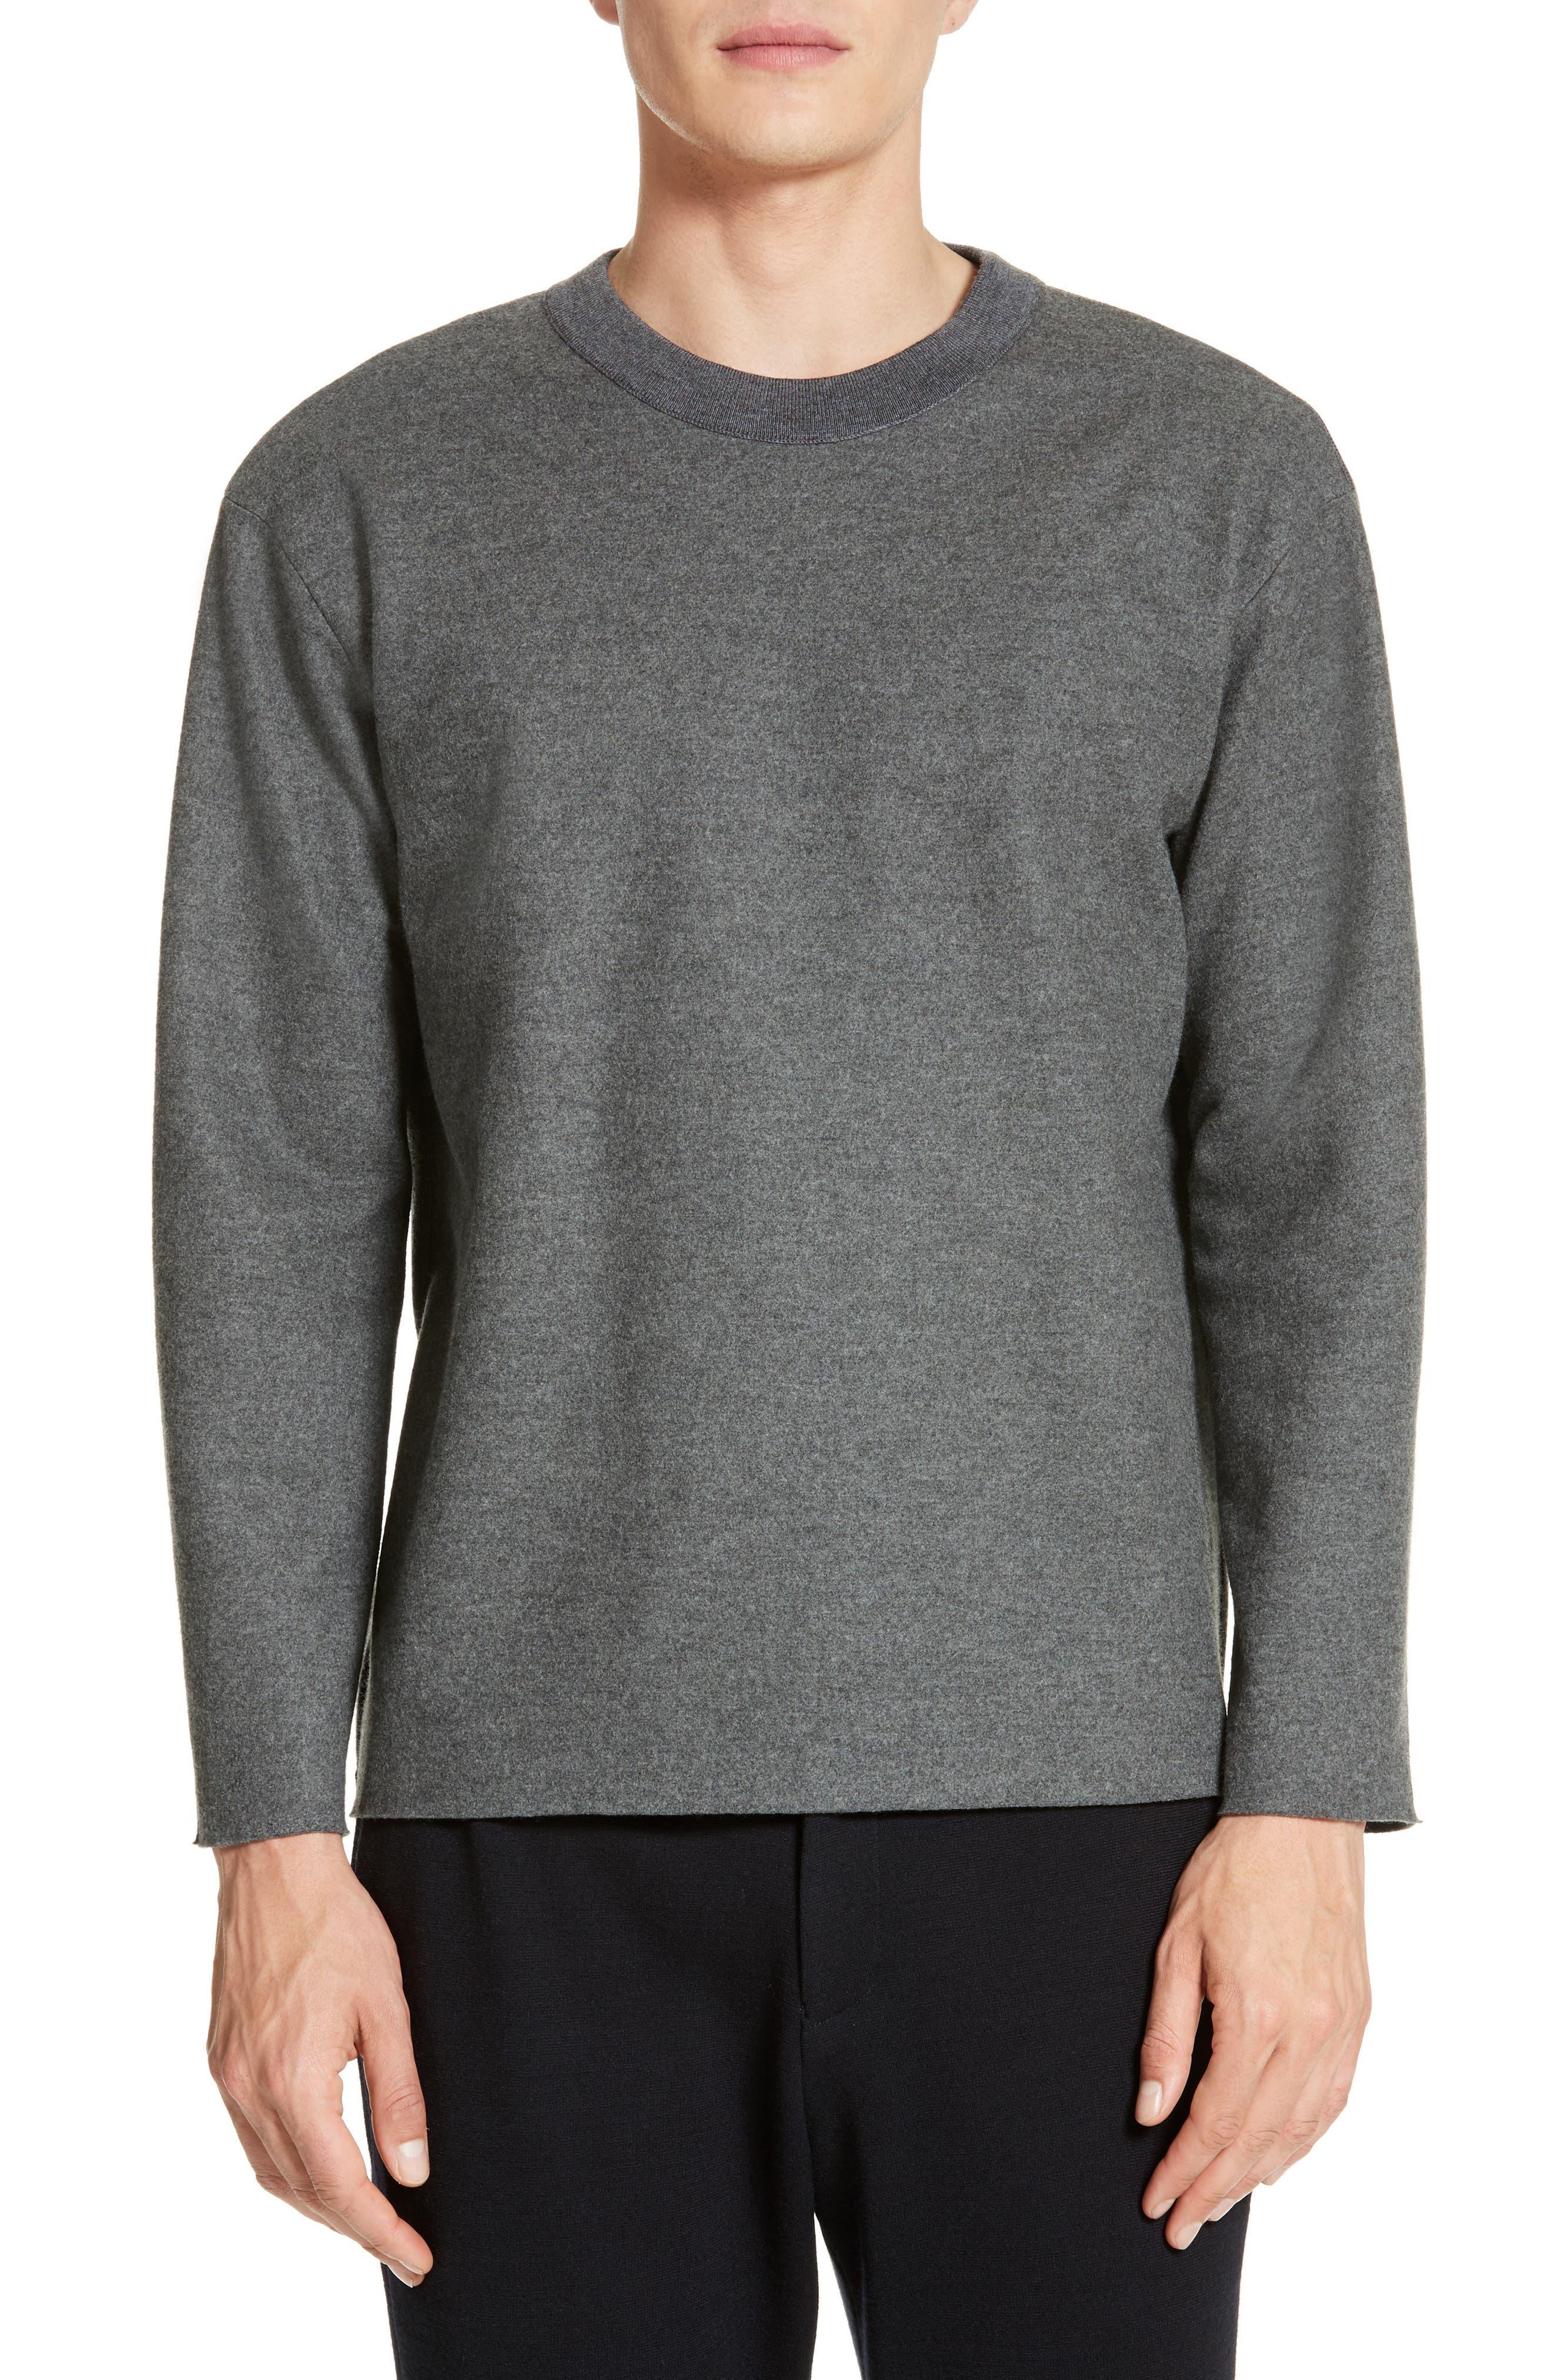 Hyper Compress Sweatshirt,                         Main,                         color, 020